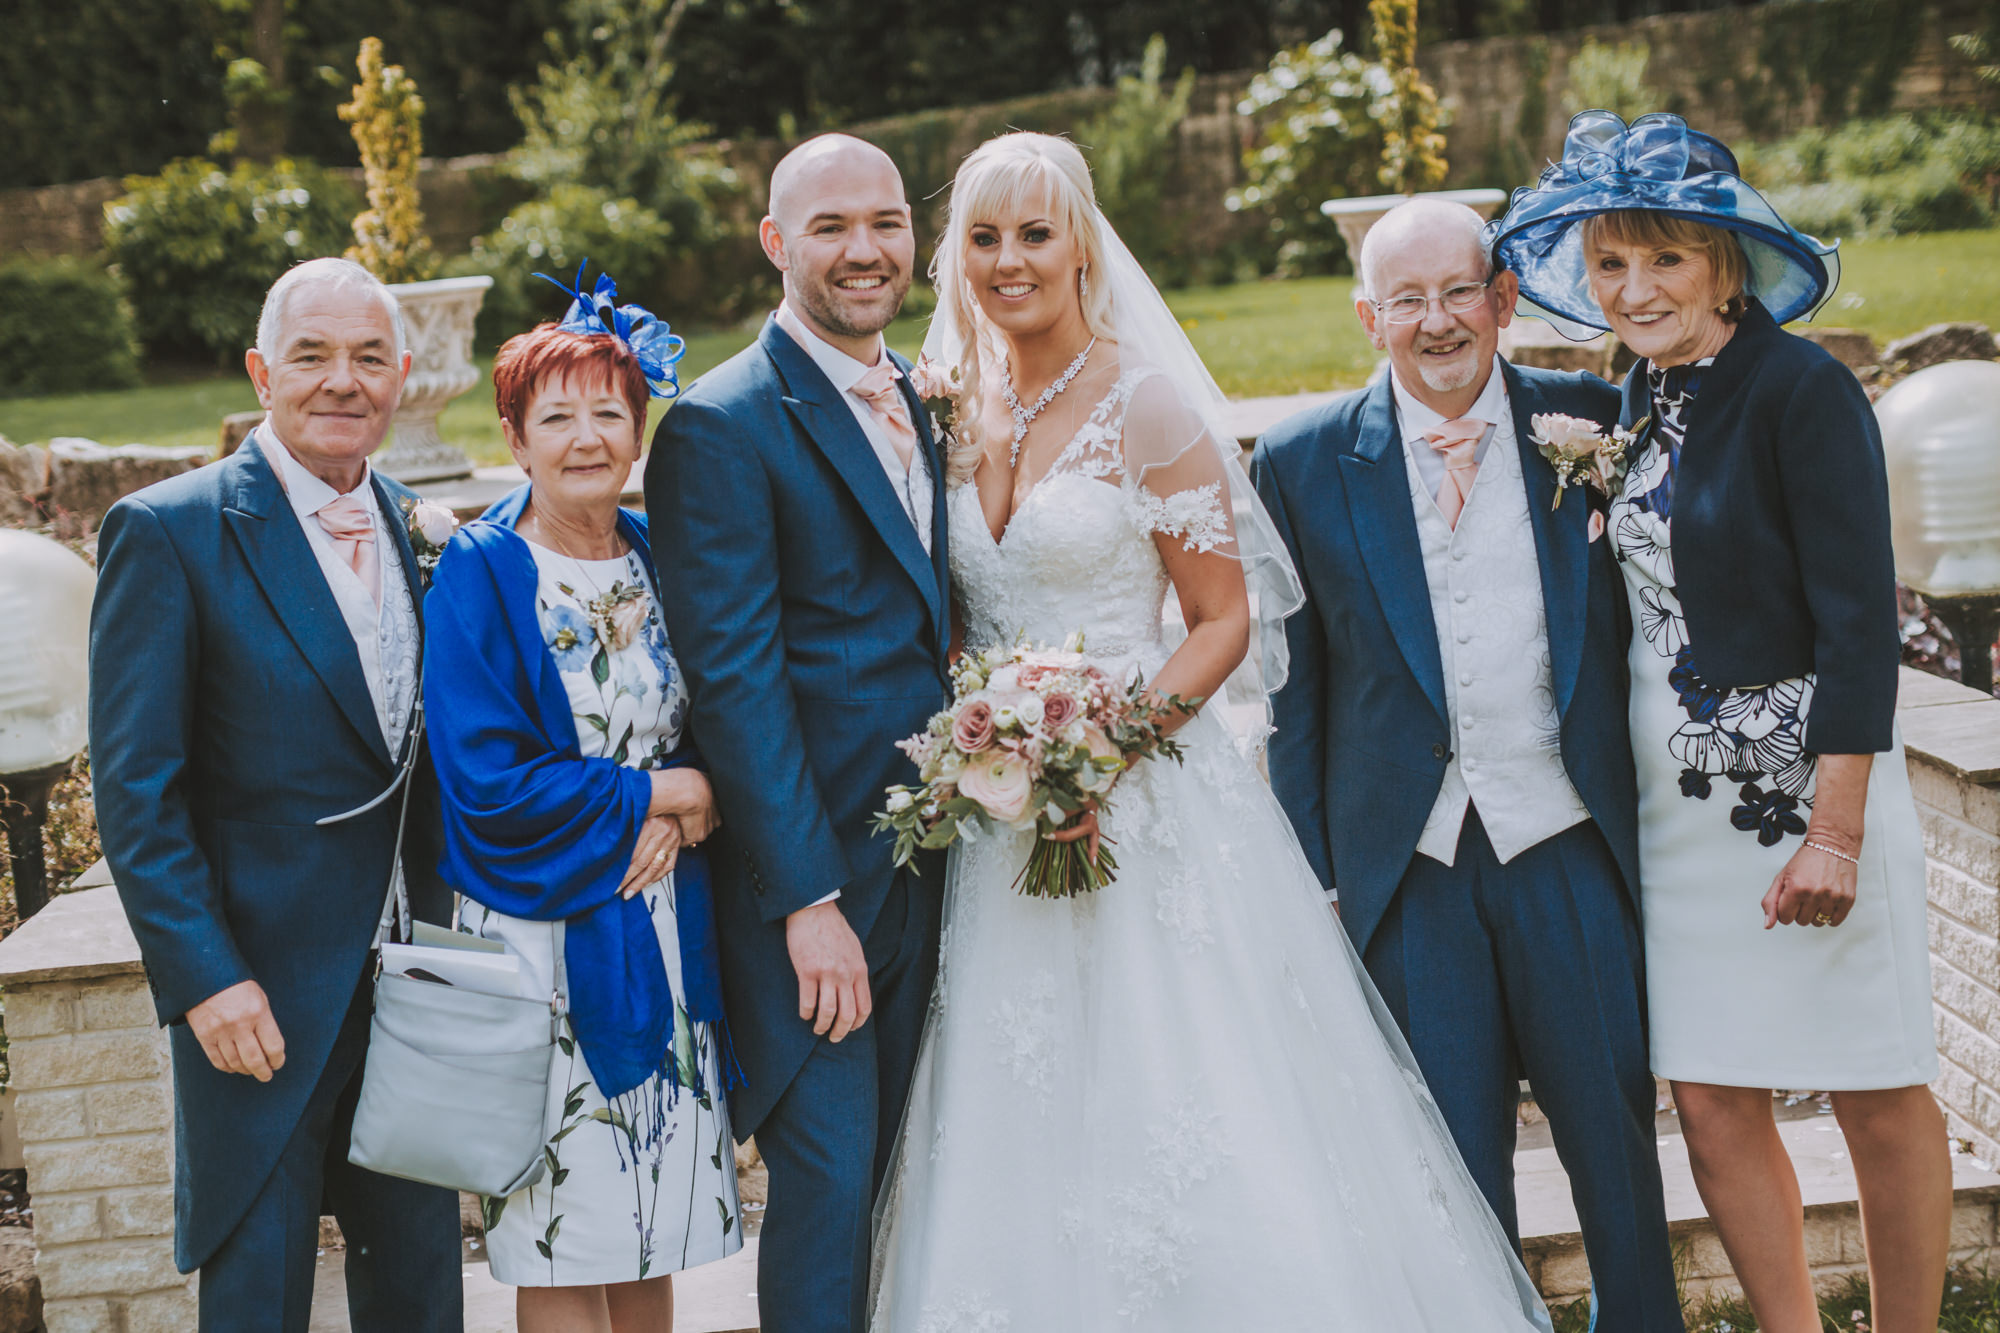 hellaby hall wedding photographers in rotherham, yorkshire-48.jpg